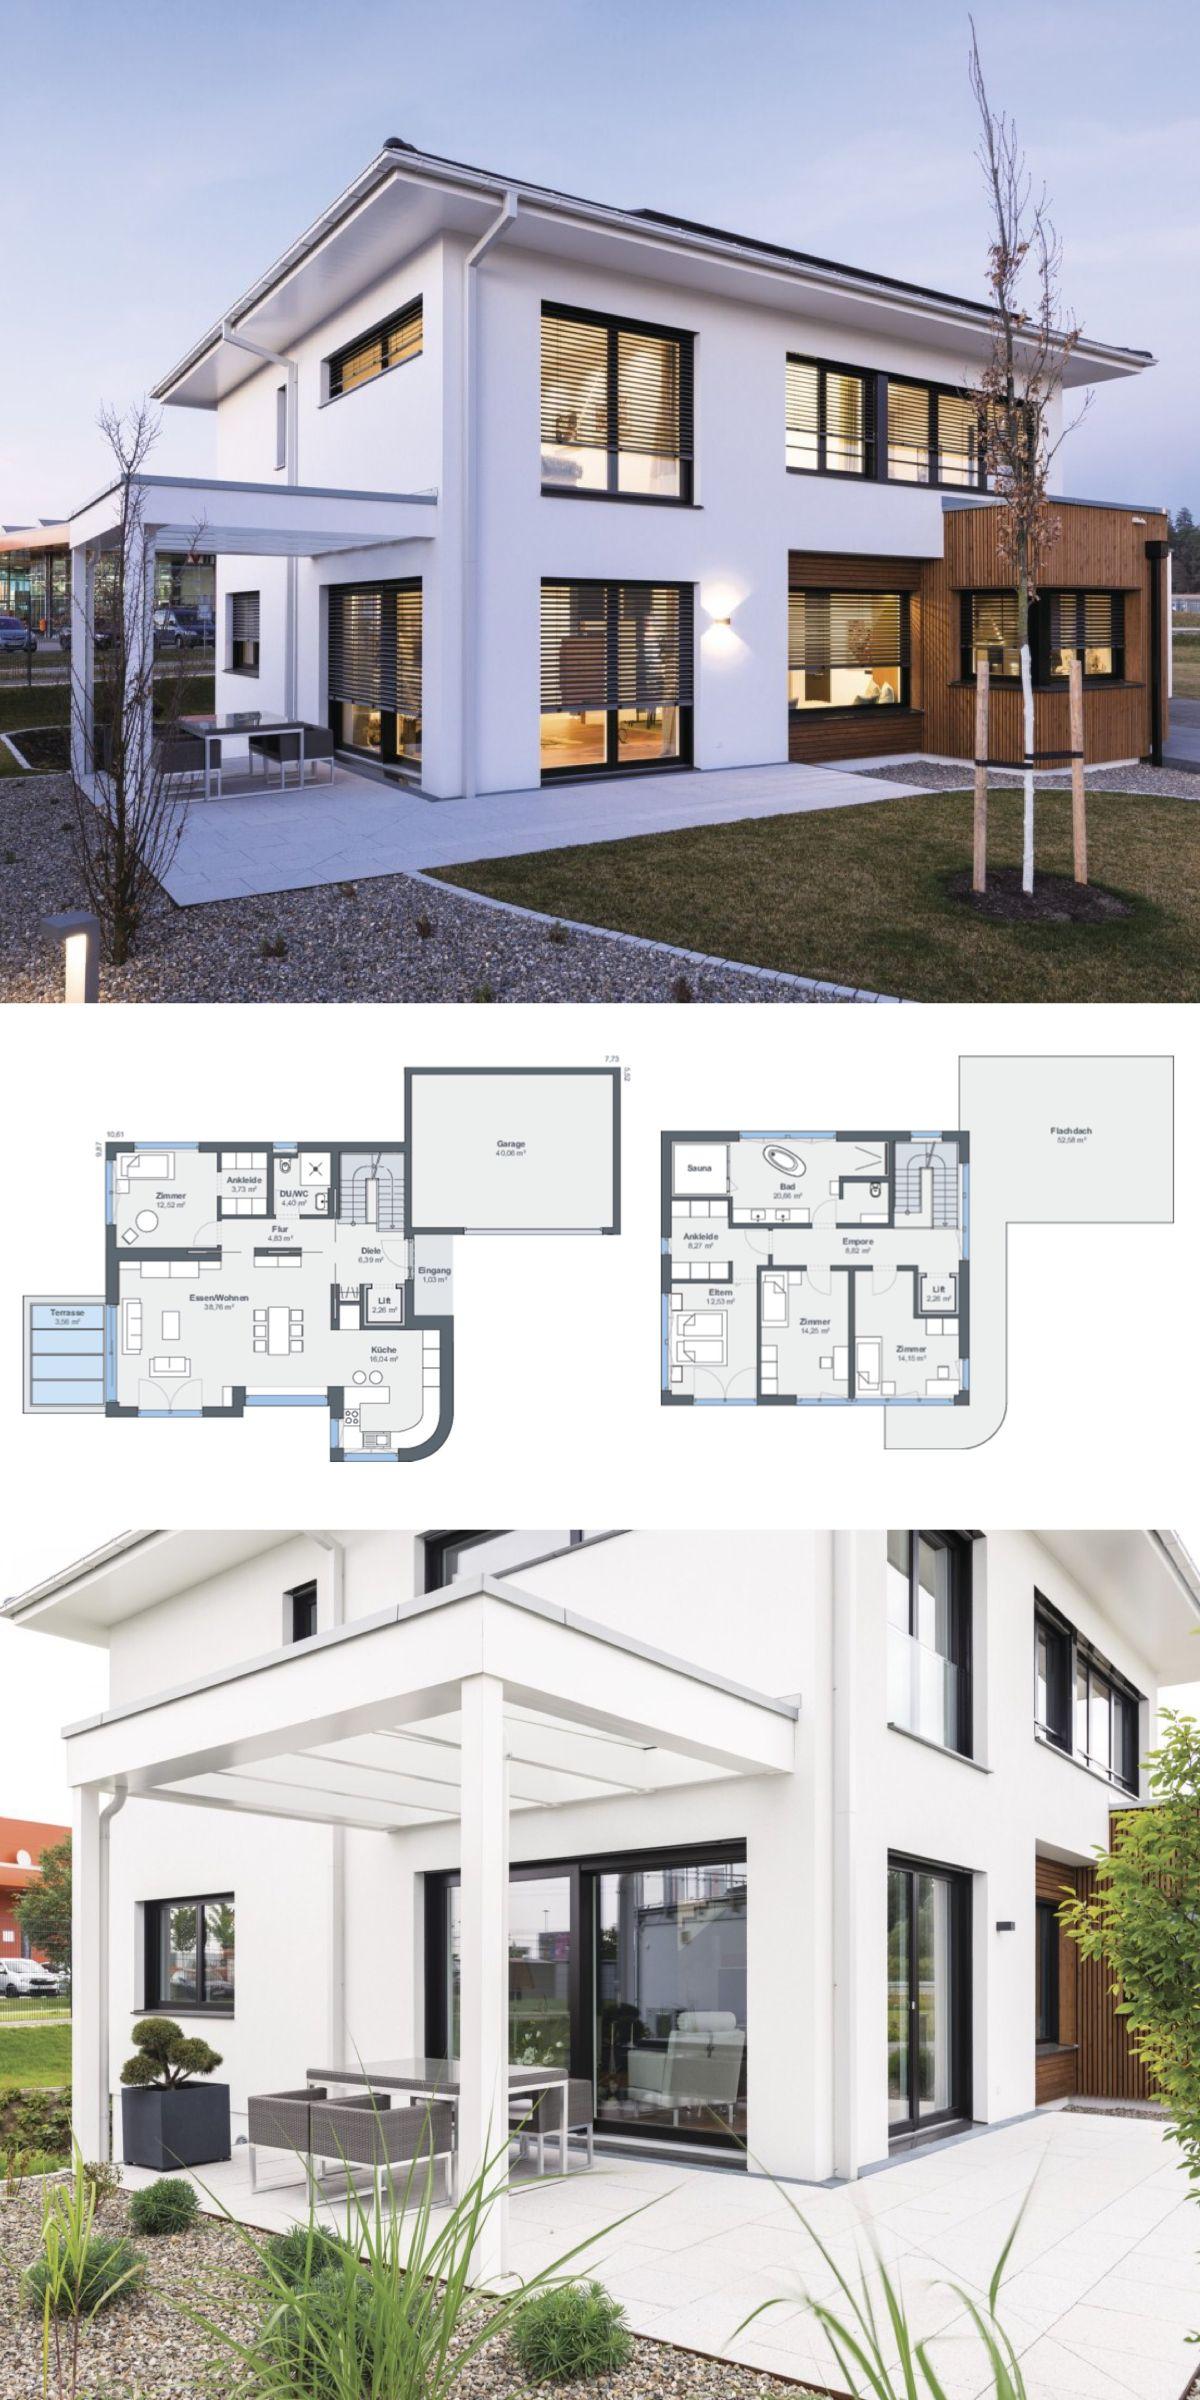 Stadtvilla Neubau Modern Mit Garage Pergola Walmdach